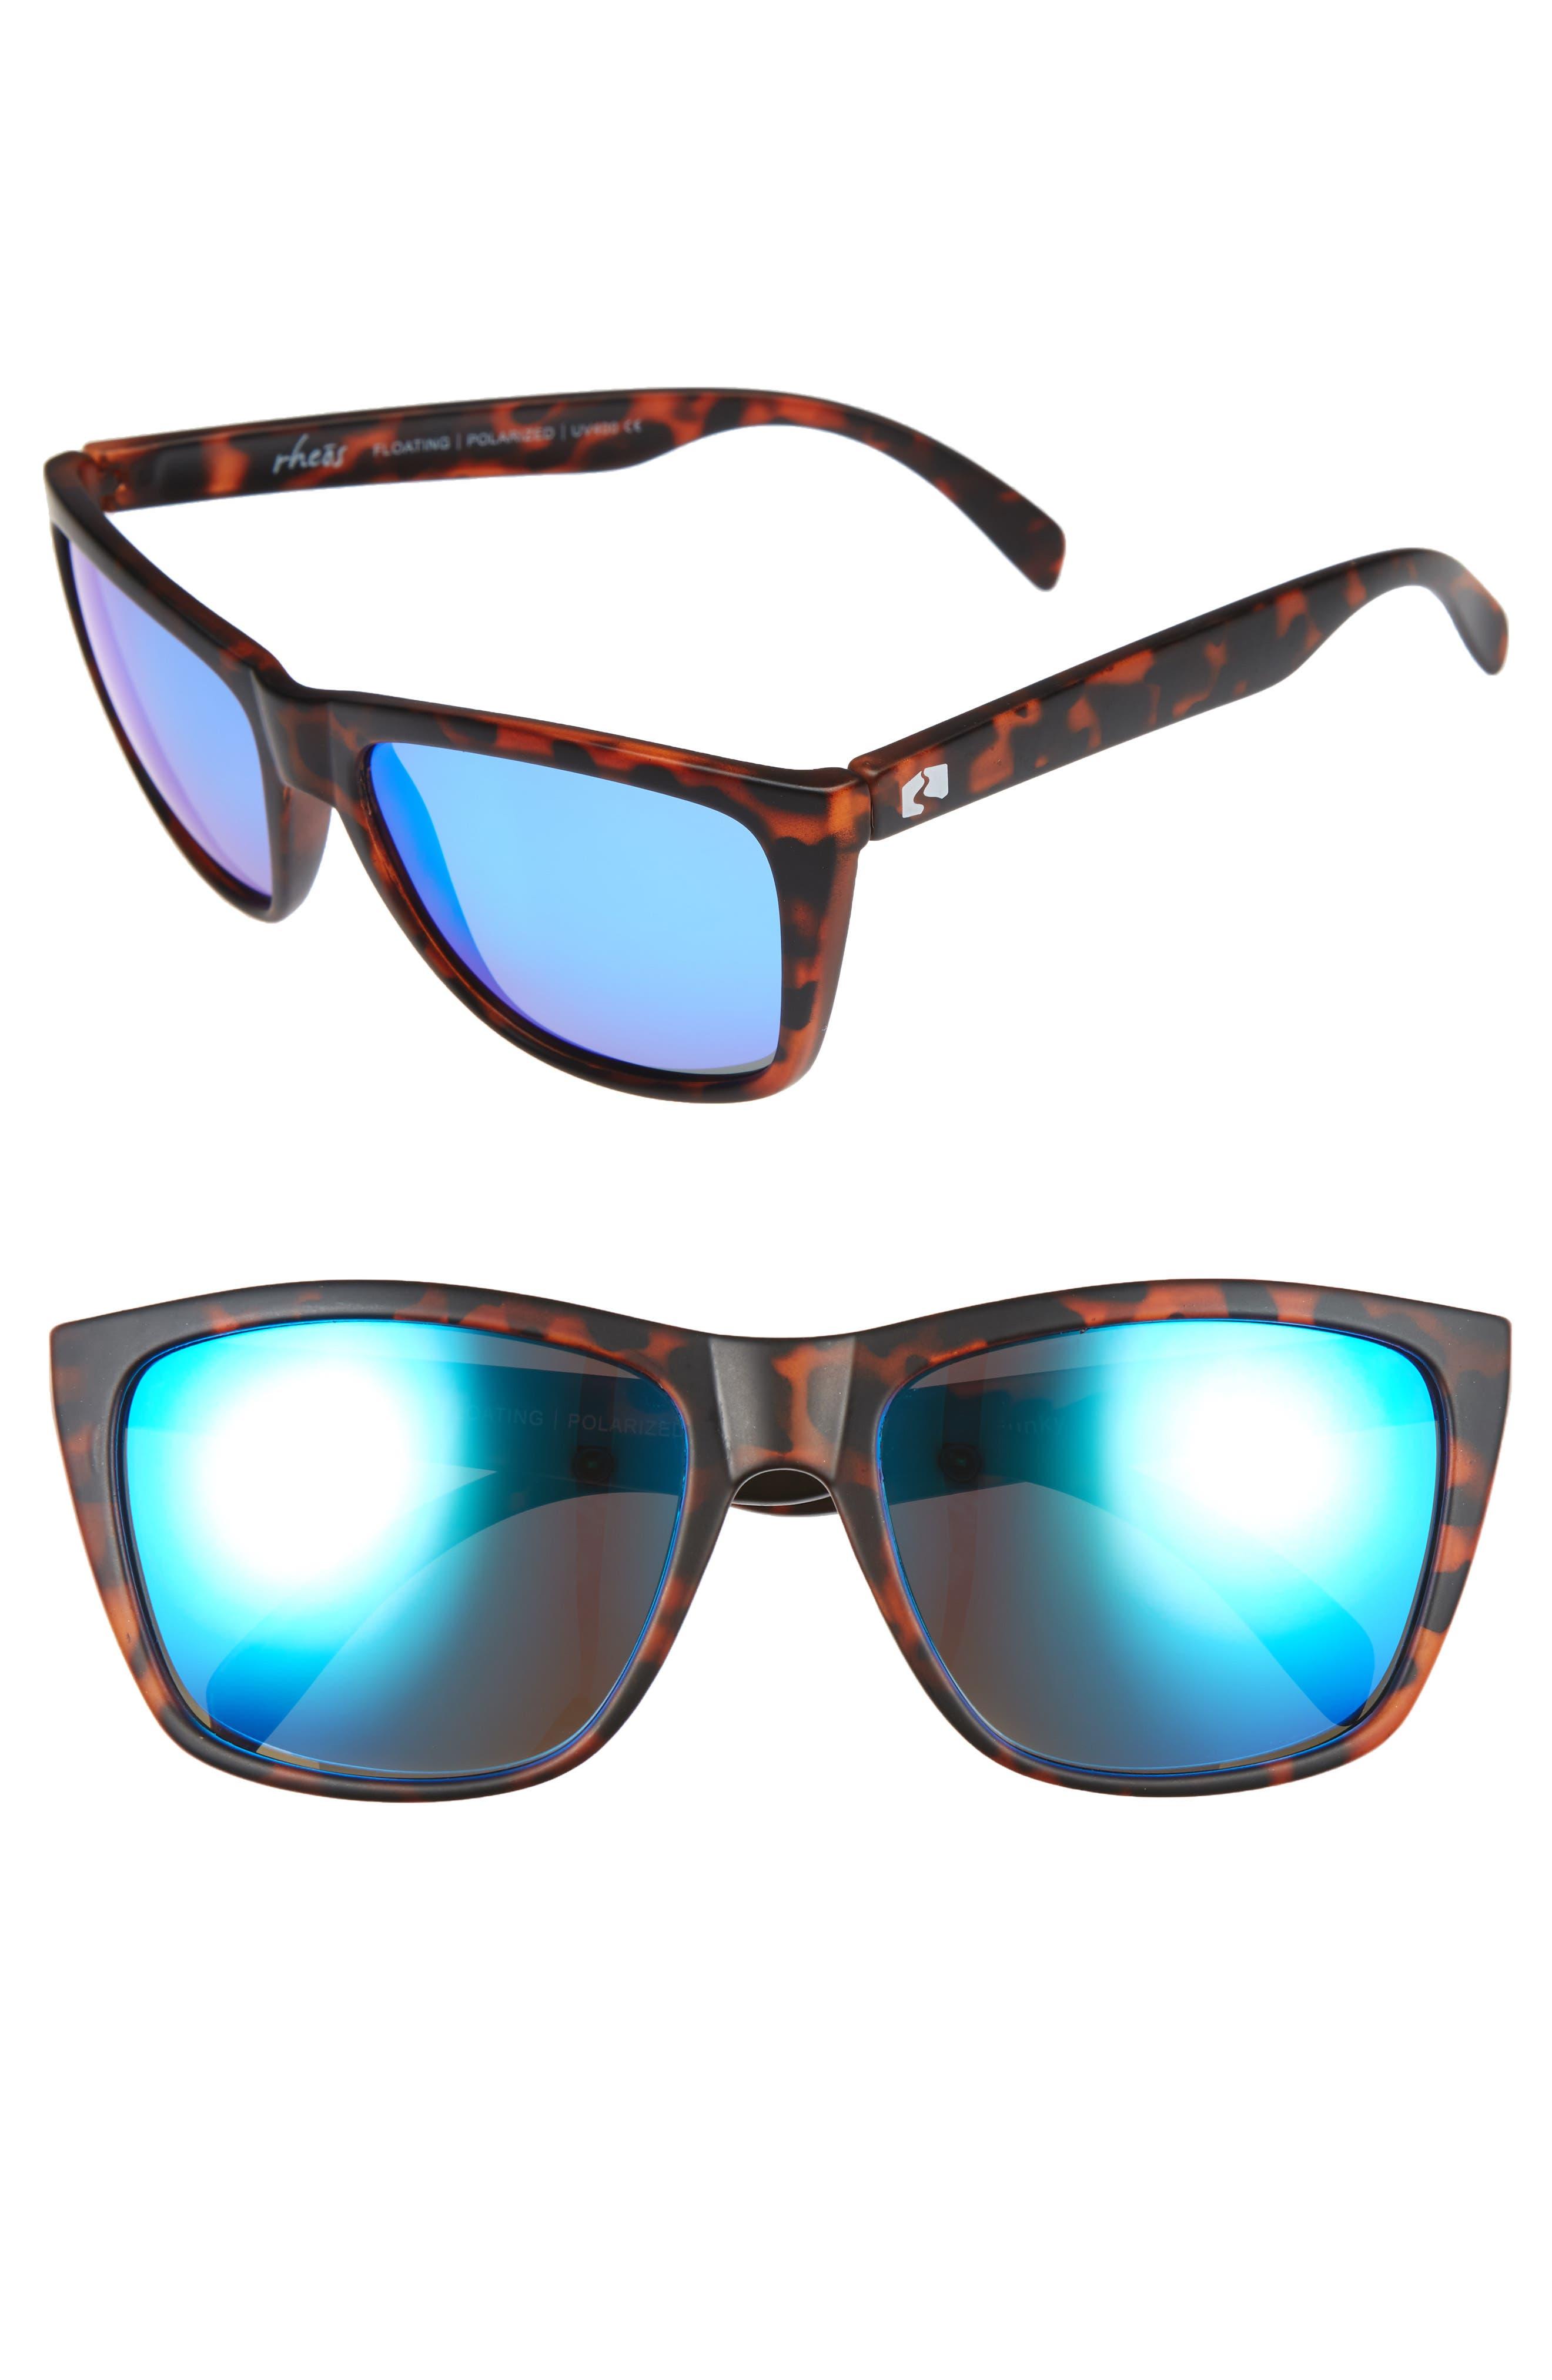 Sapelos Floating 61mm Polarized Sunglasses,                         Main,                         color, Tortoise/ Marine